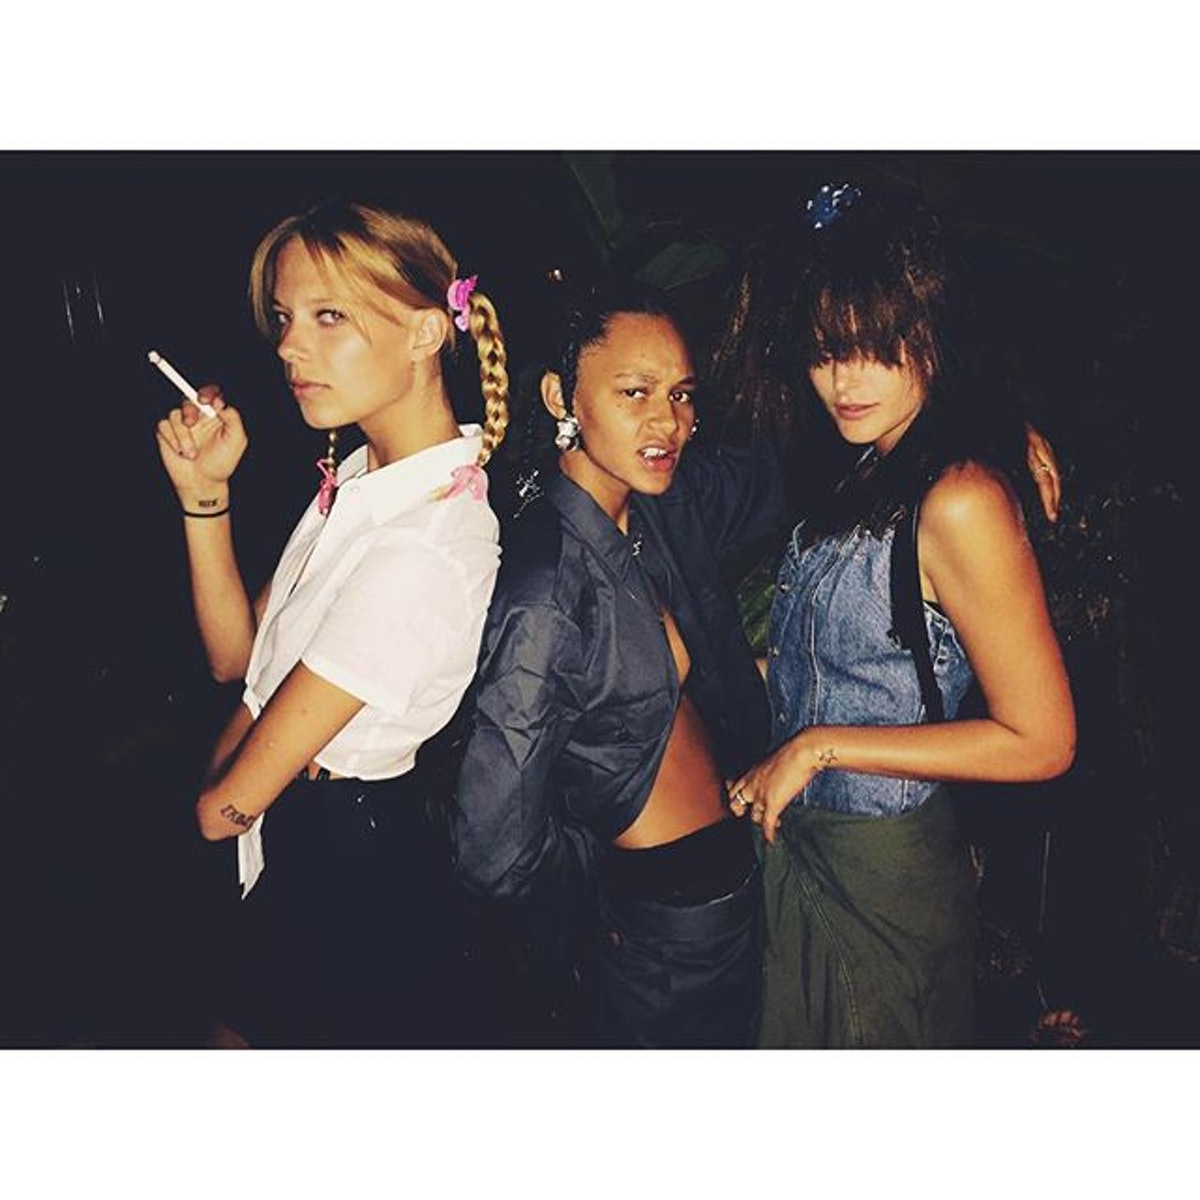 Fashion week party girls